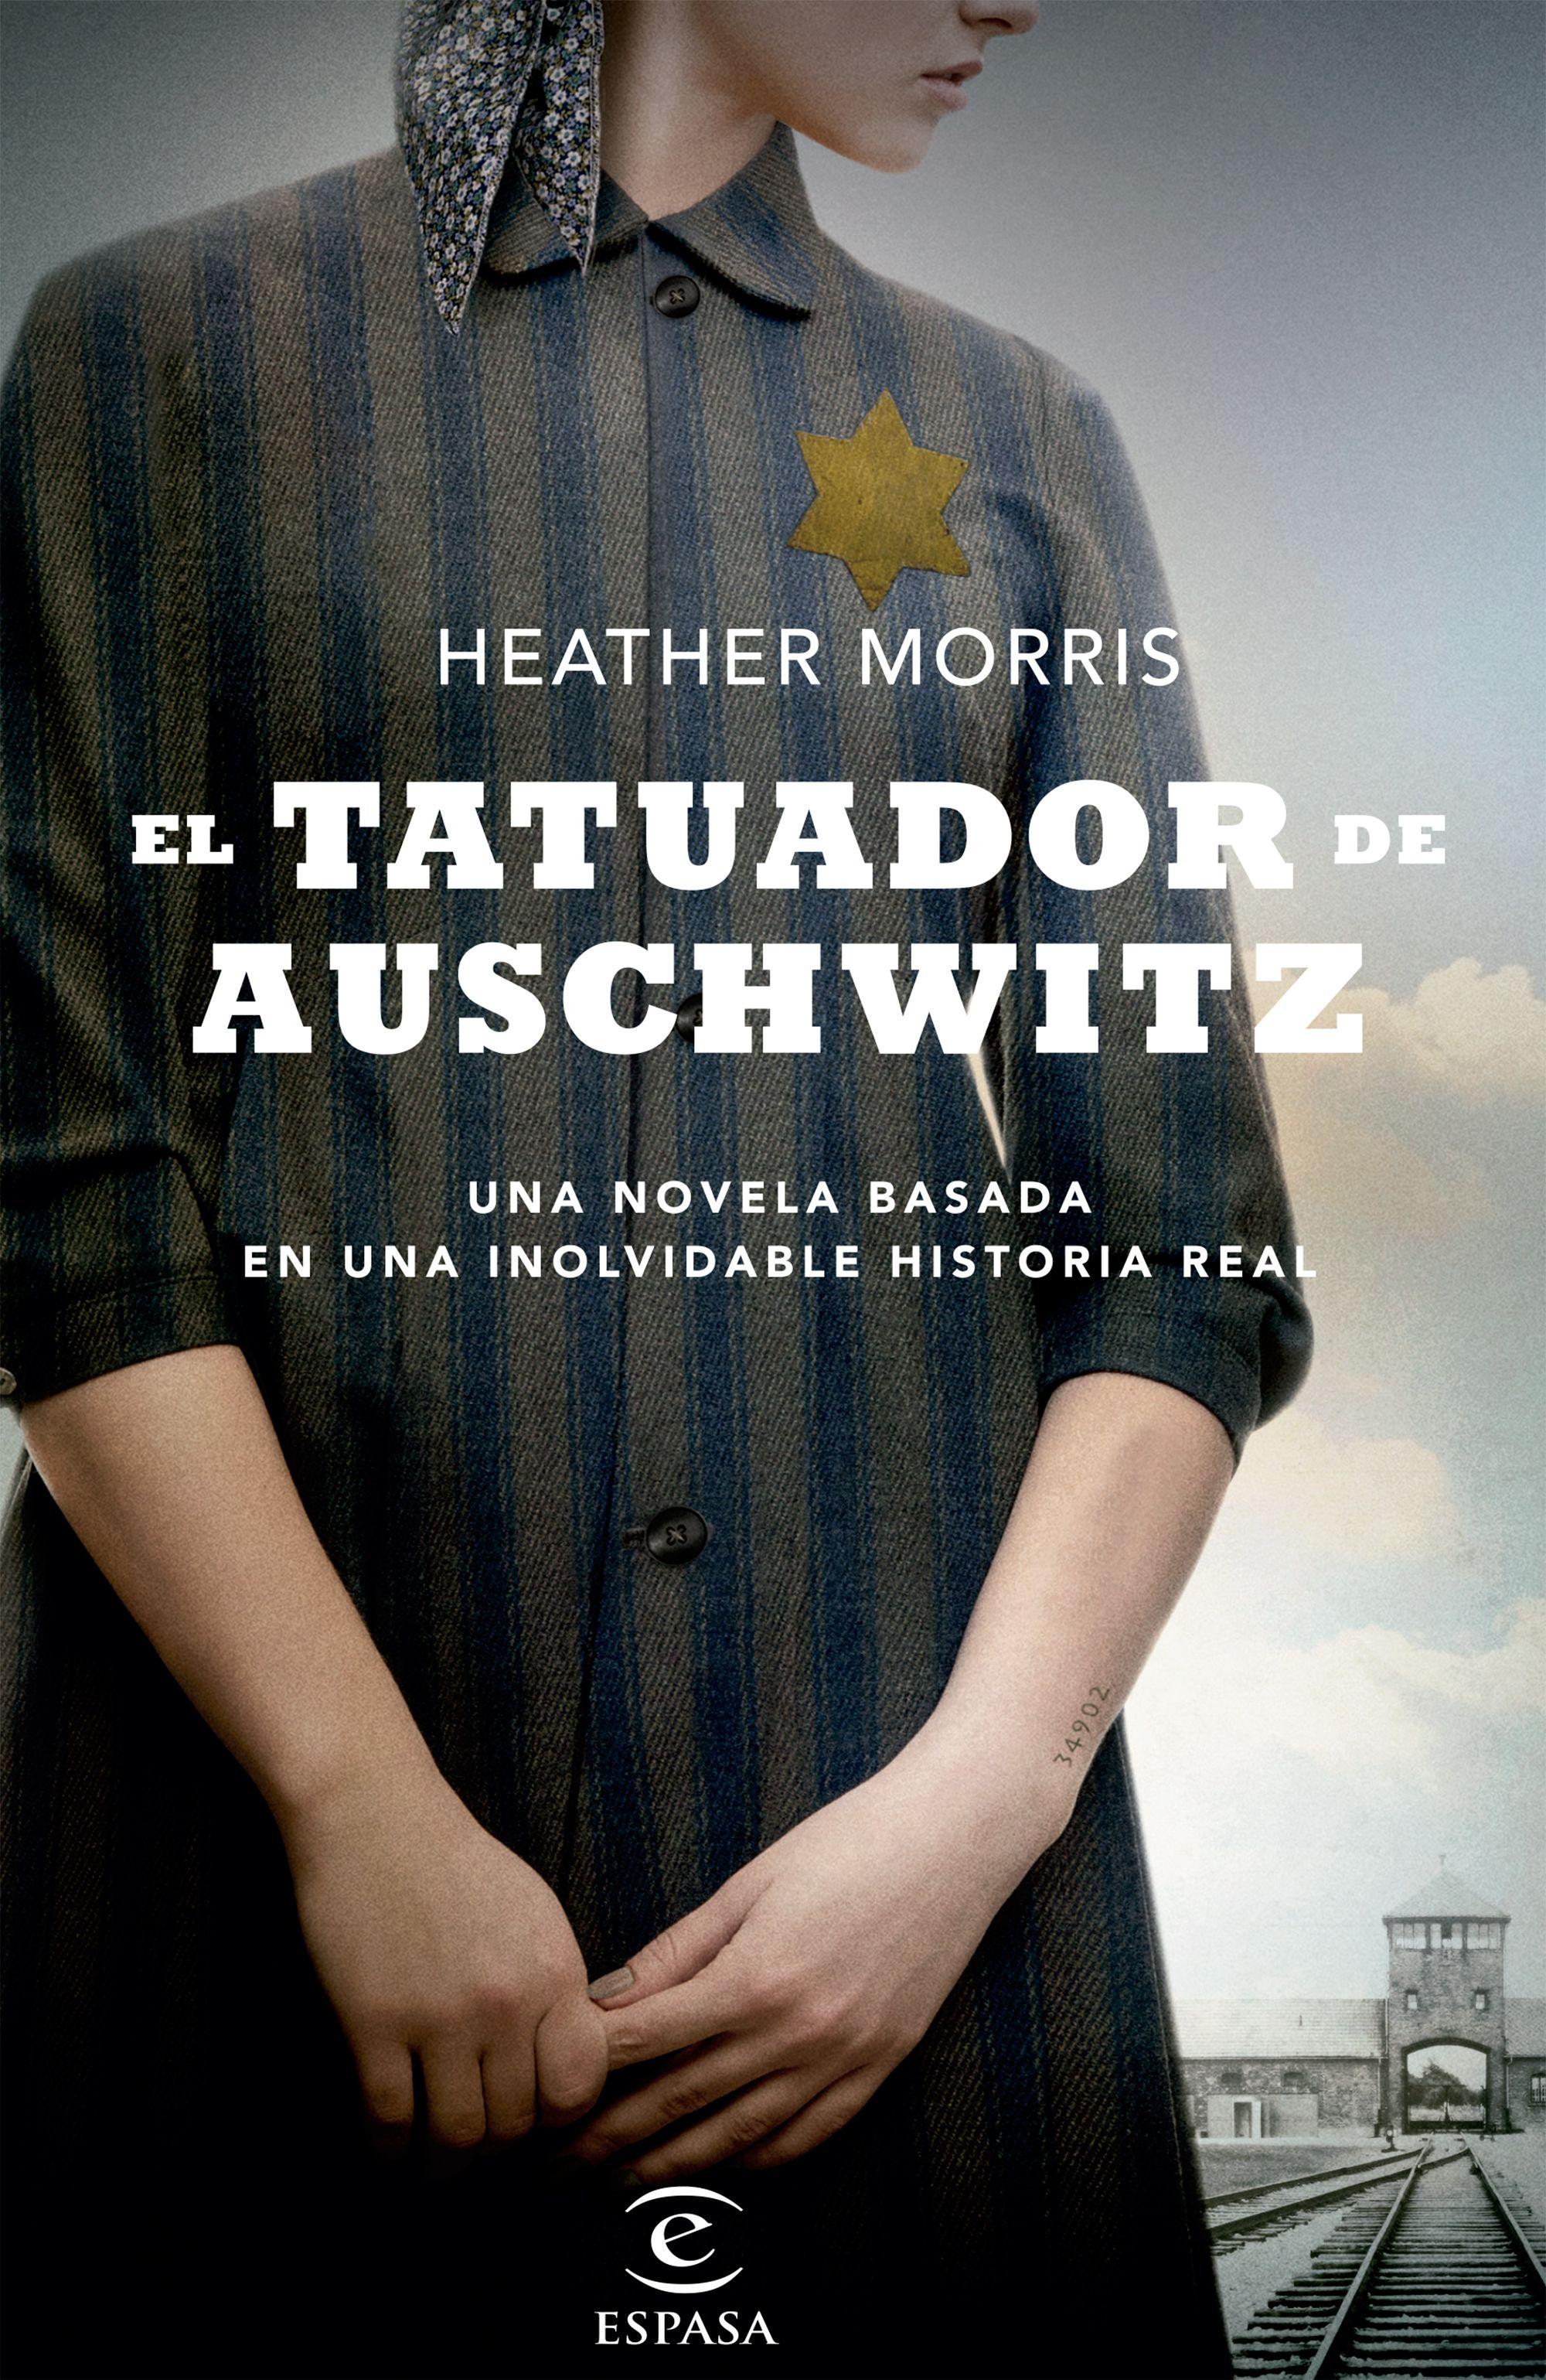 El Tatuador de Auschwitz. Una Novela Basada en una Inolvidable Historia Real - Heather Morris - Espasa